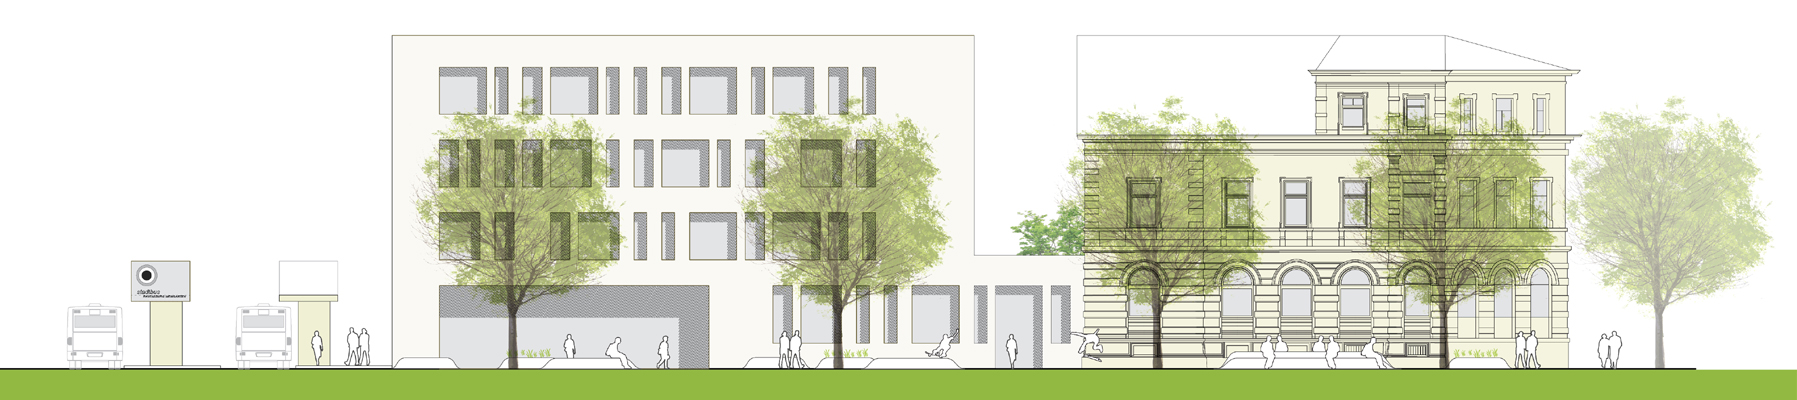 postquartier ravensburg roterpunkt architekten. Black Bedroom Furniture Sets. Home Design Ideas